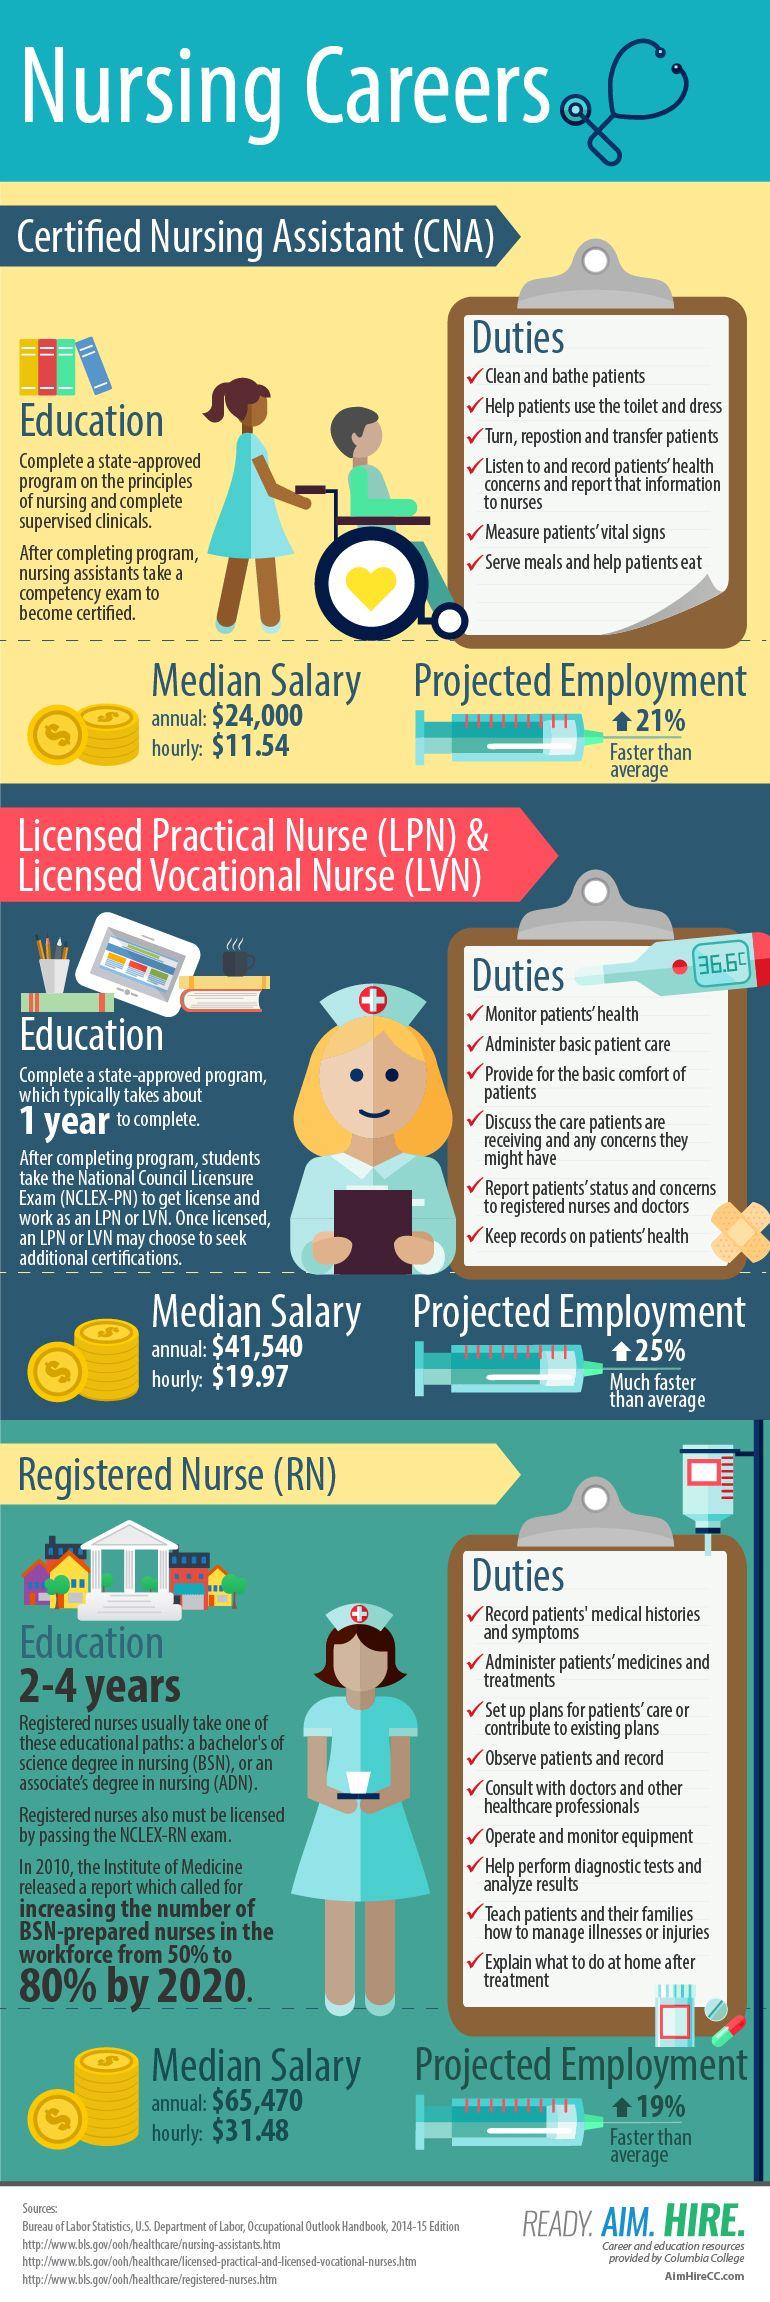 nursing careers infographic, lpn, cna, rn, lvn registered nurse, Cephalic Vein